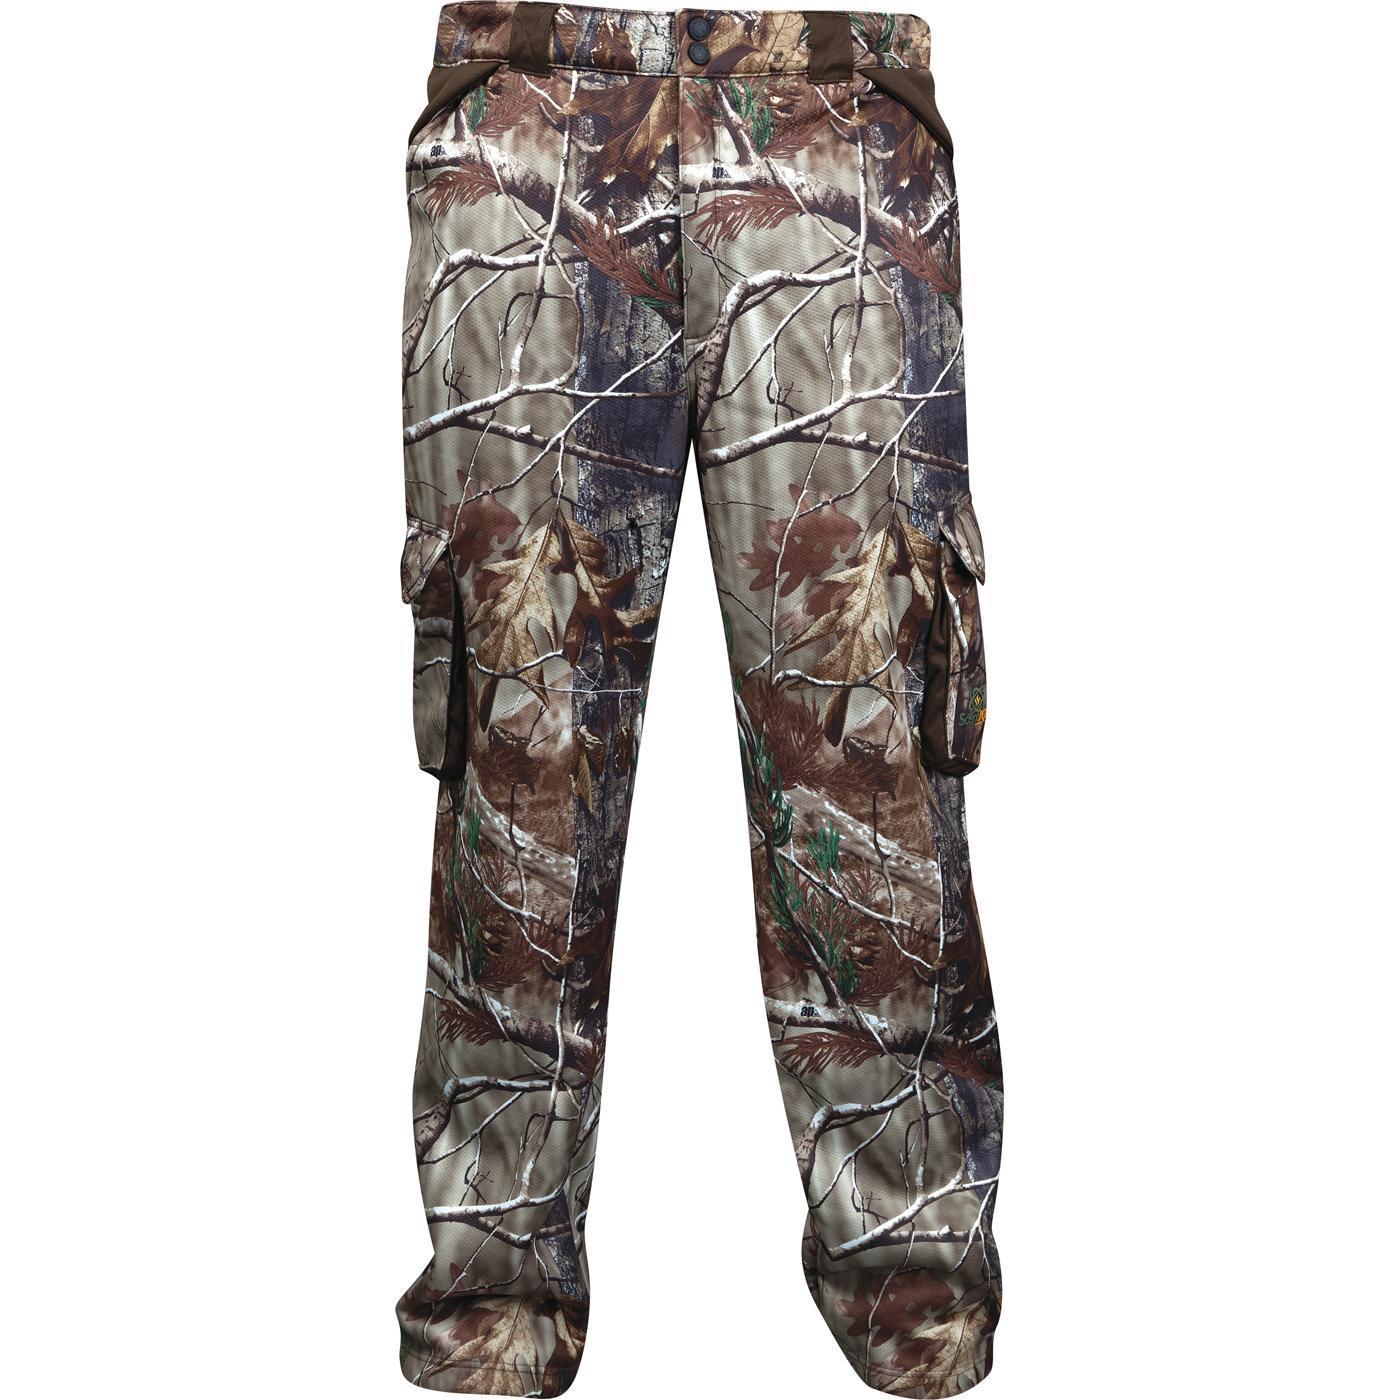 Pantalones Rocky Athletic Mobility para hombre - Estilo n.º 600386 2873cf7d7ffb